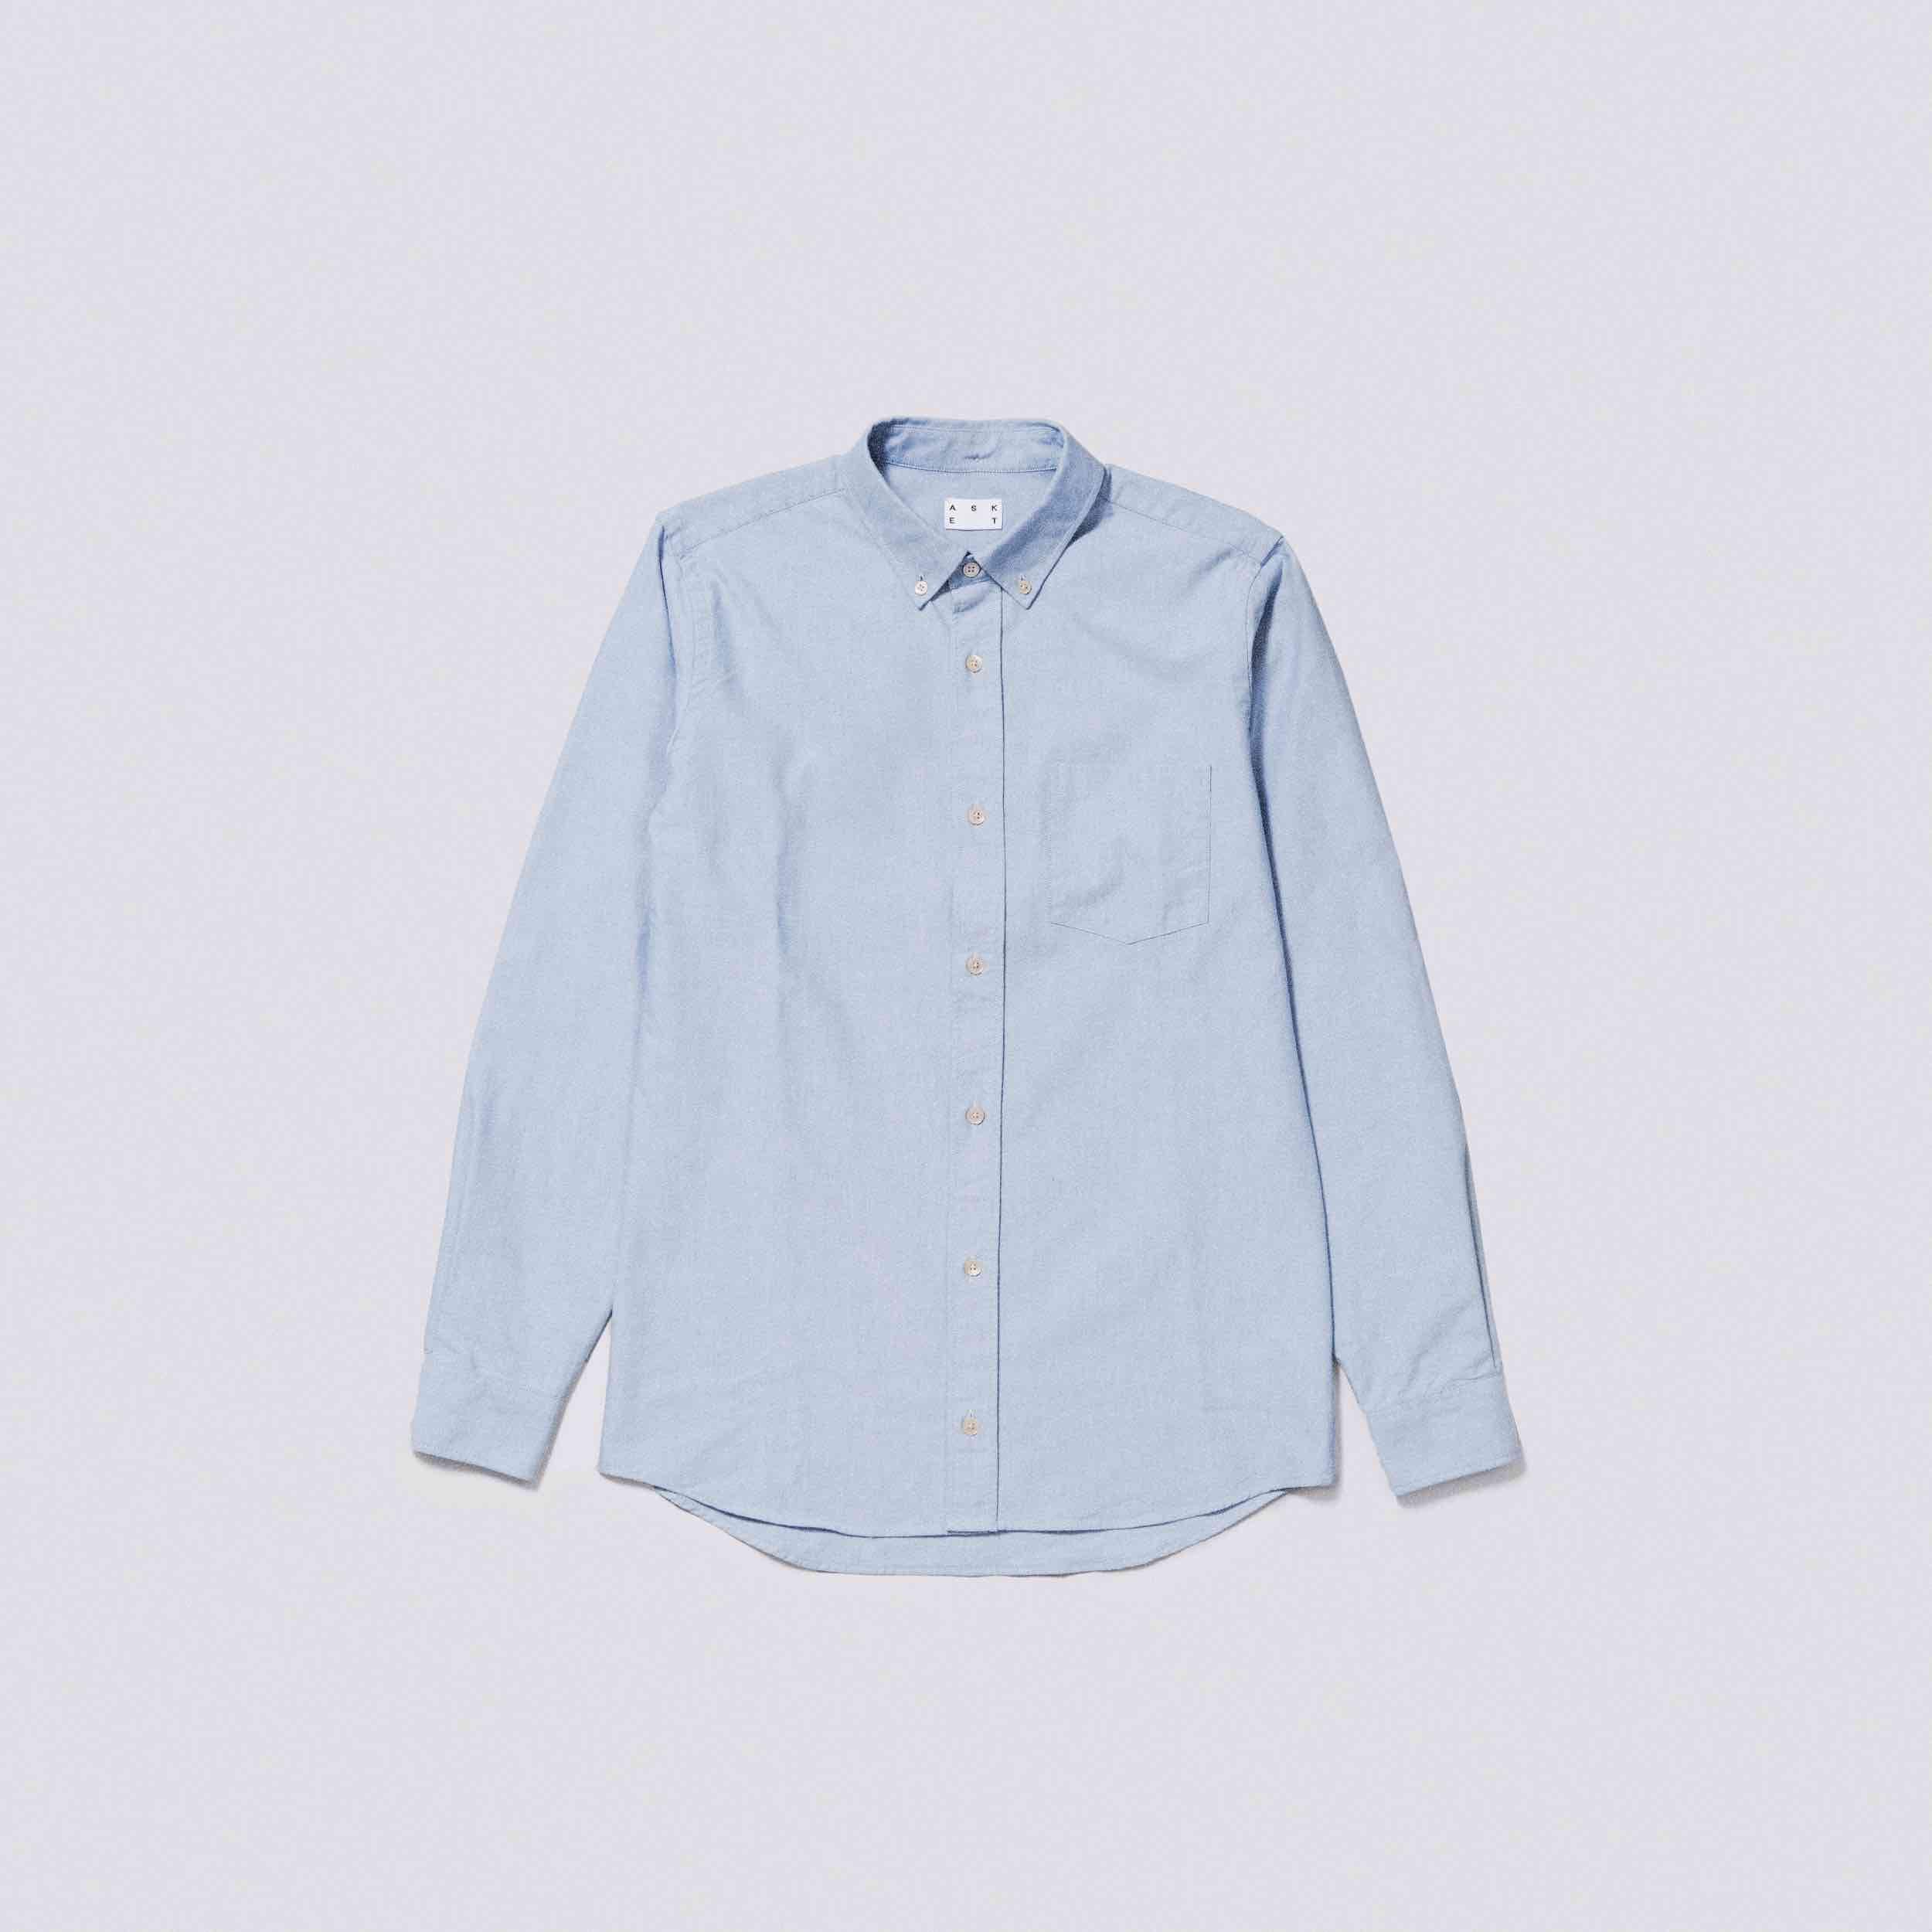 d27484febf5 Blue Oxford Shirt  asket